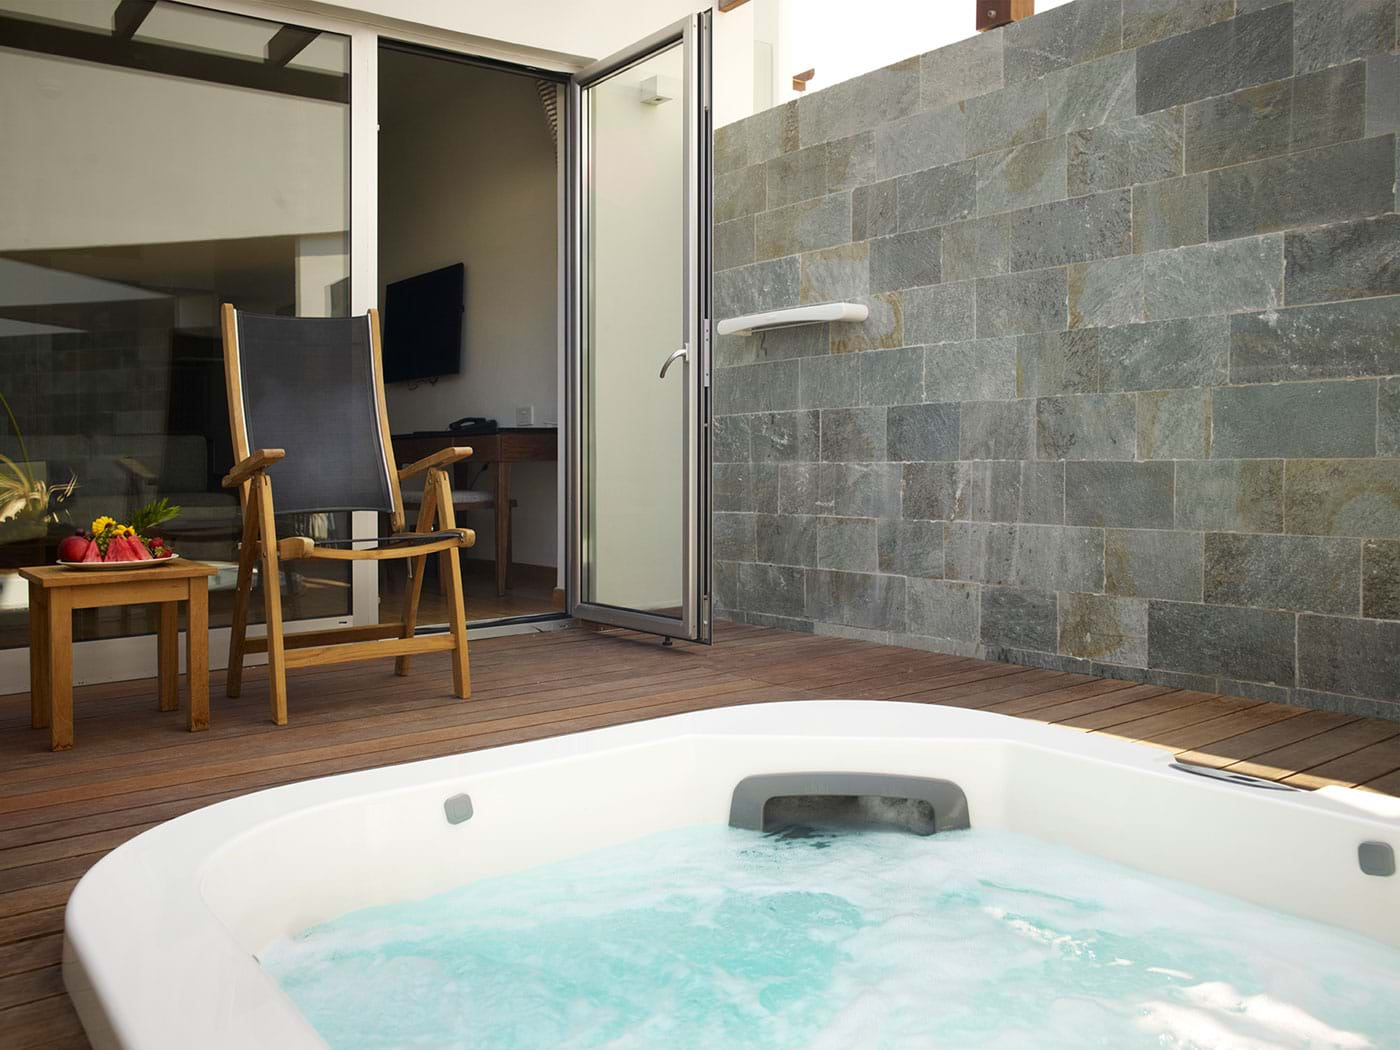 Rooms And Suites Sunrise Pearl Hotel Amp Spa Protaras